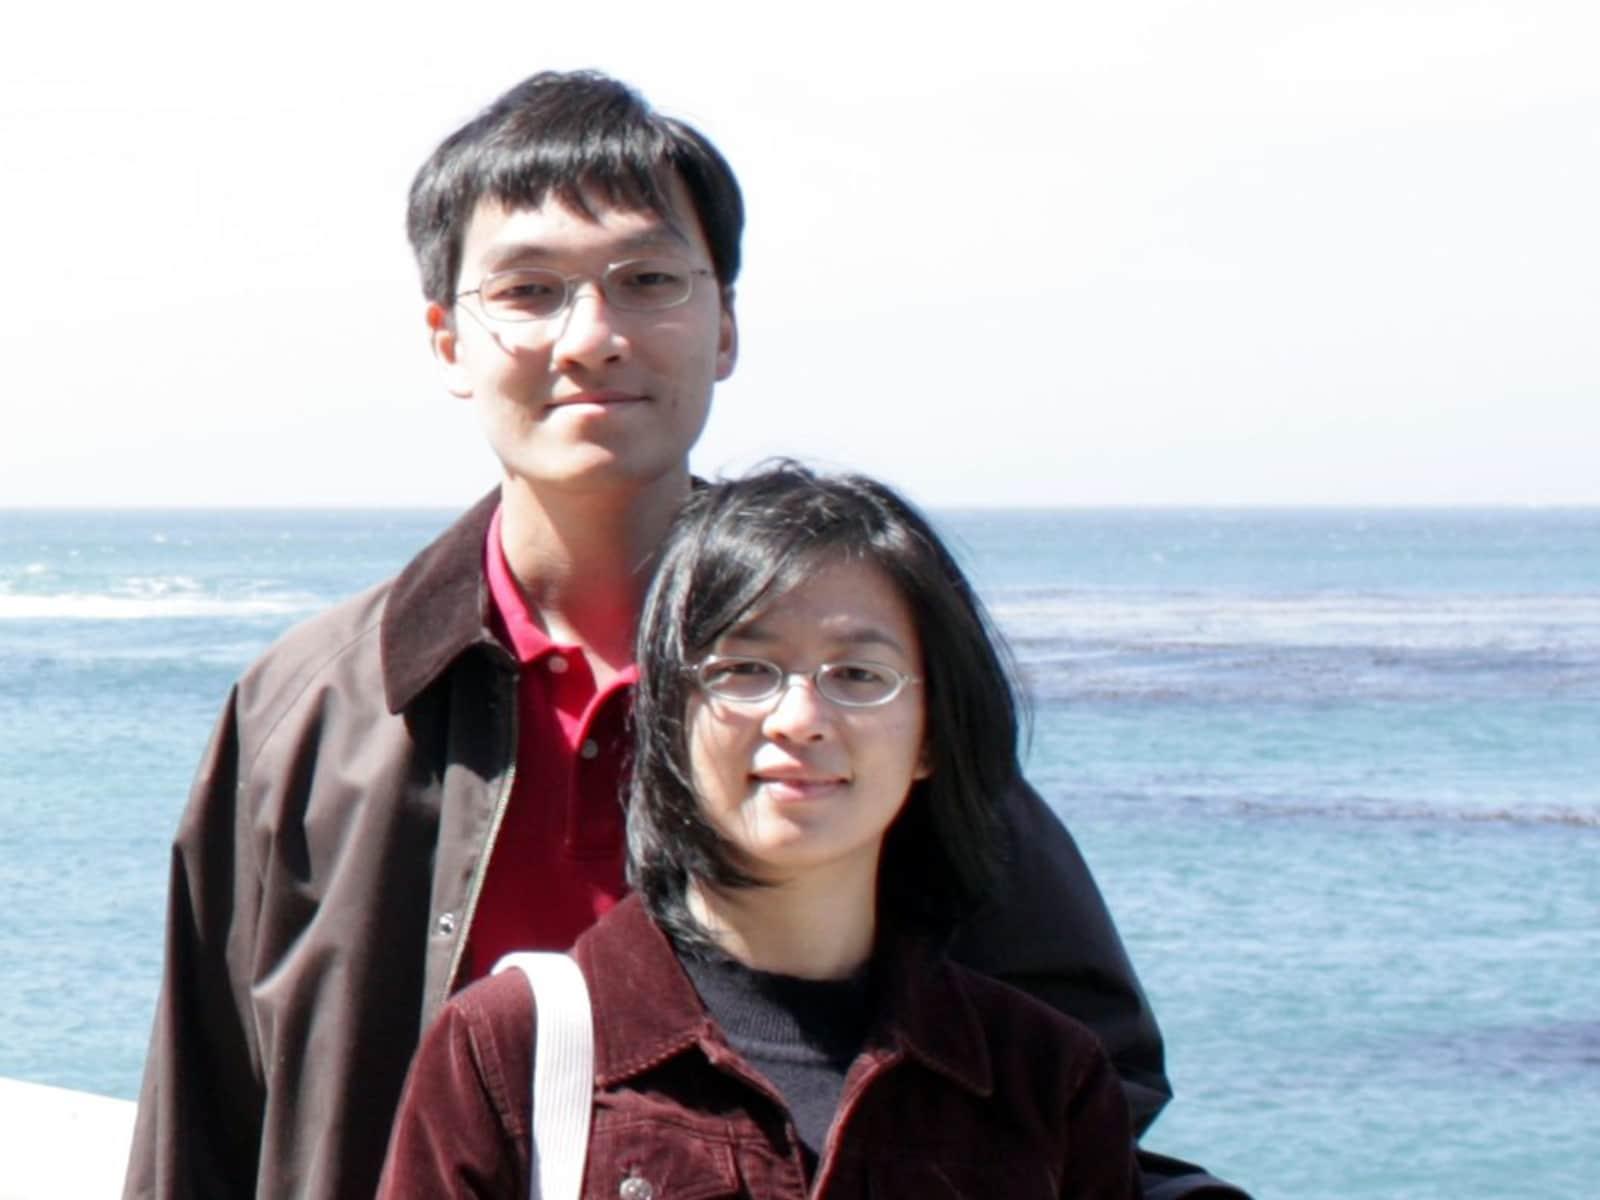 Anita & Piti from Rochester, Minnesota, United States